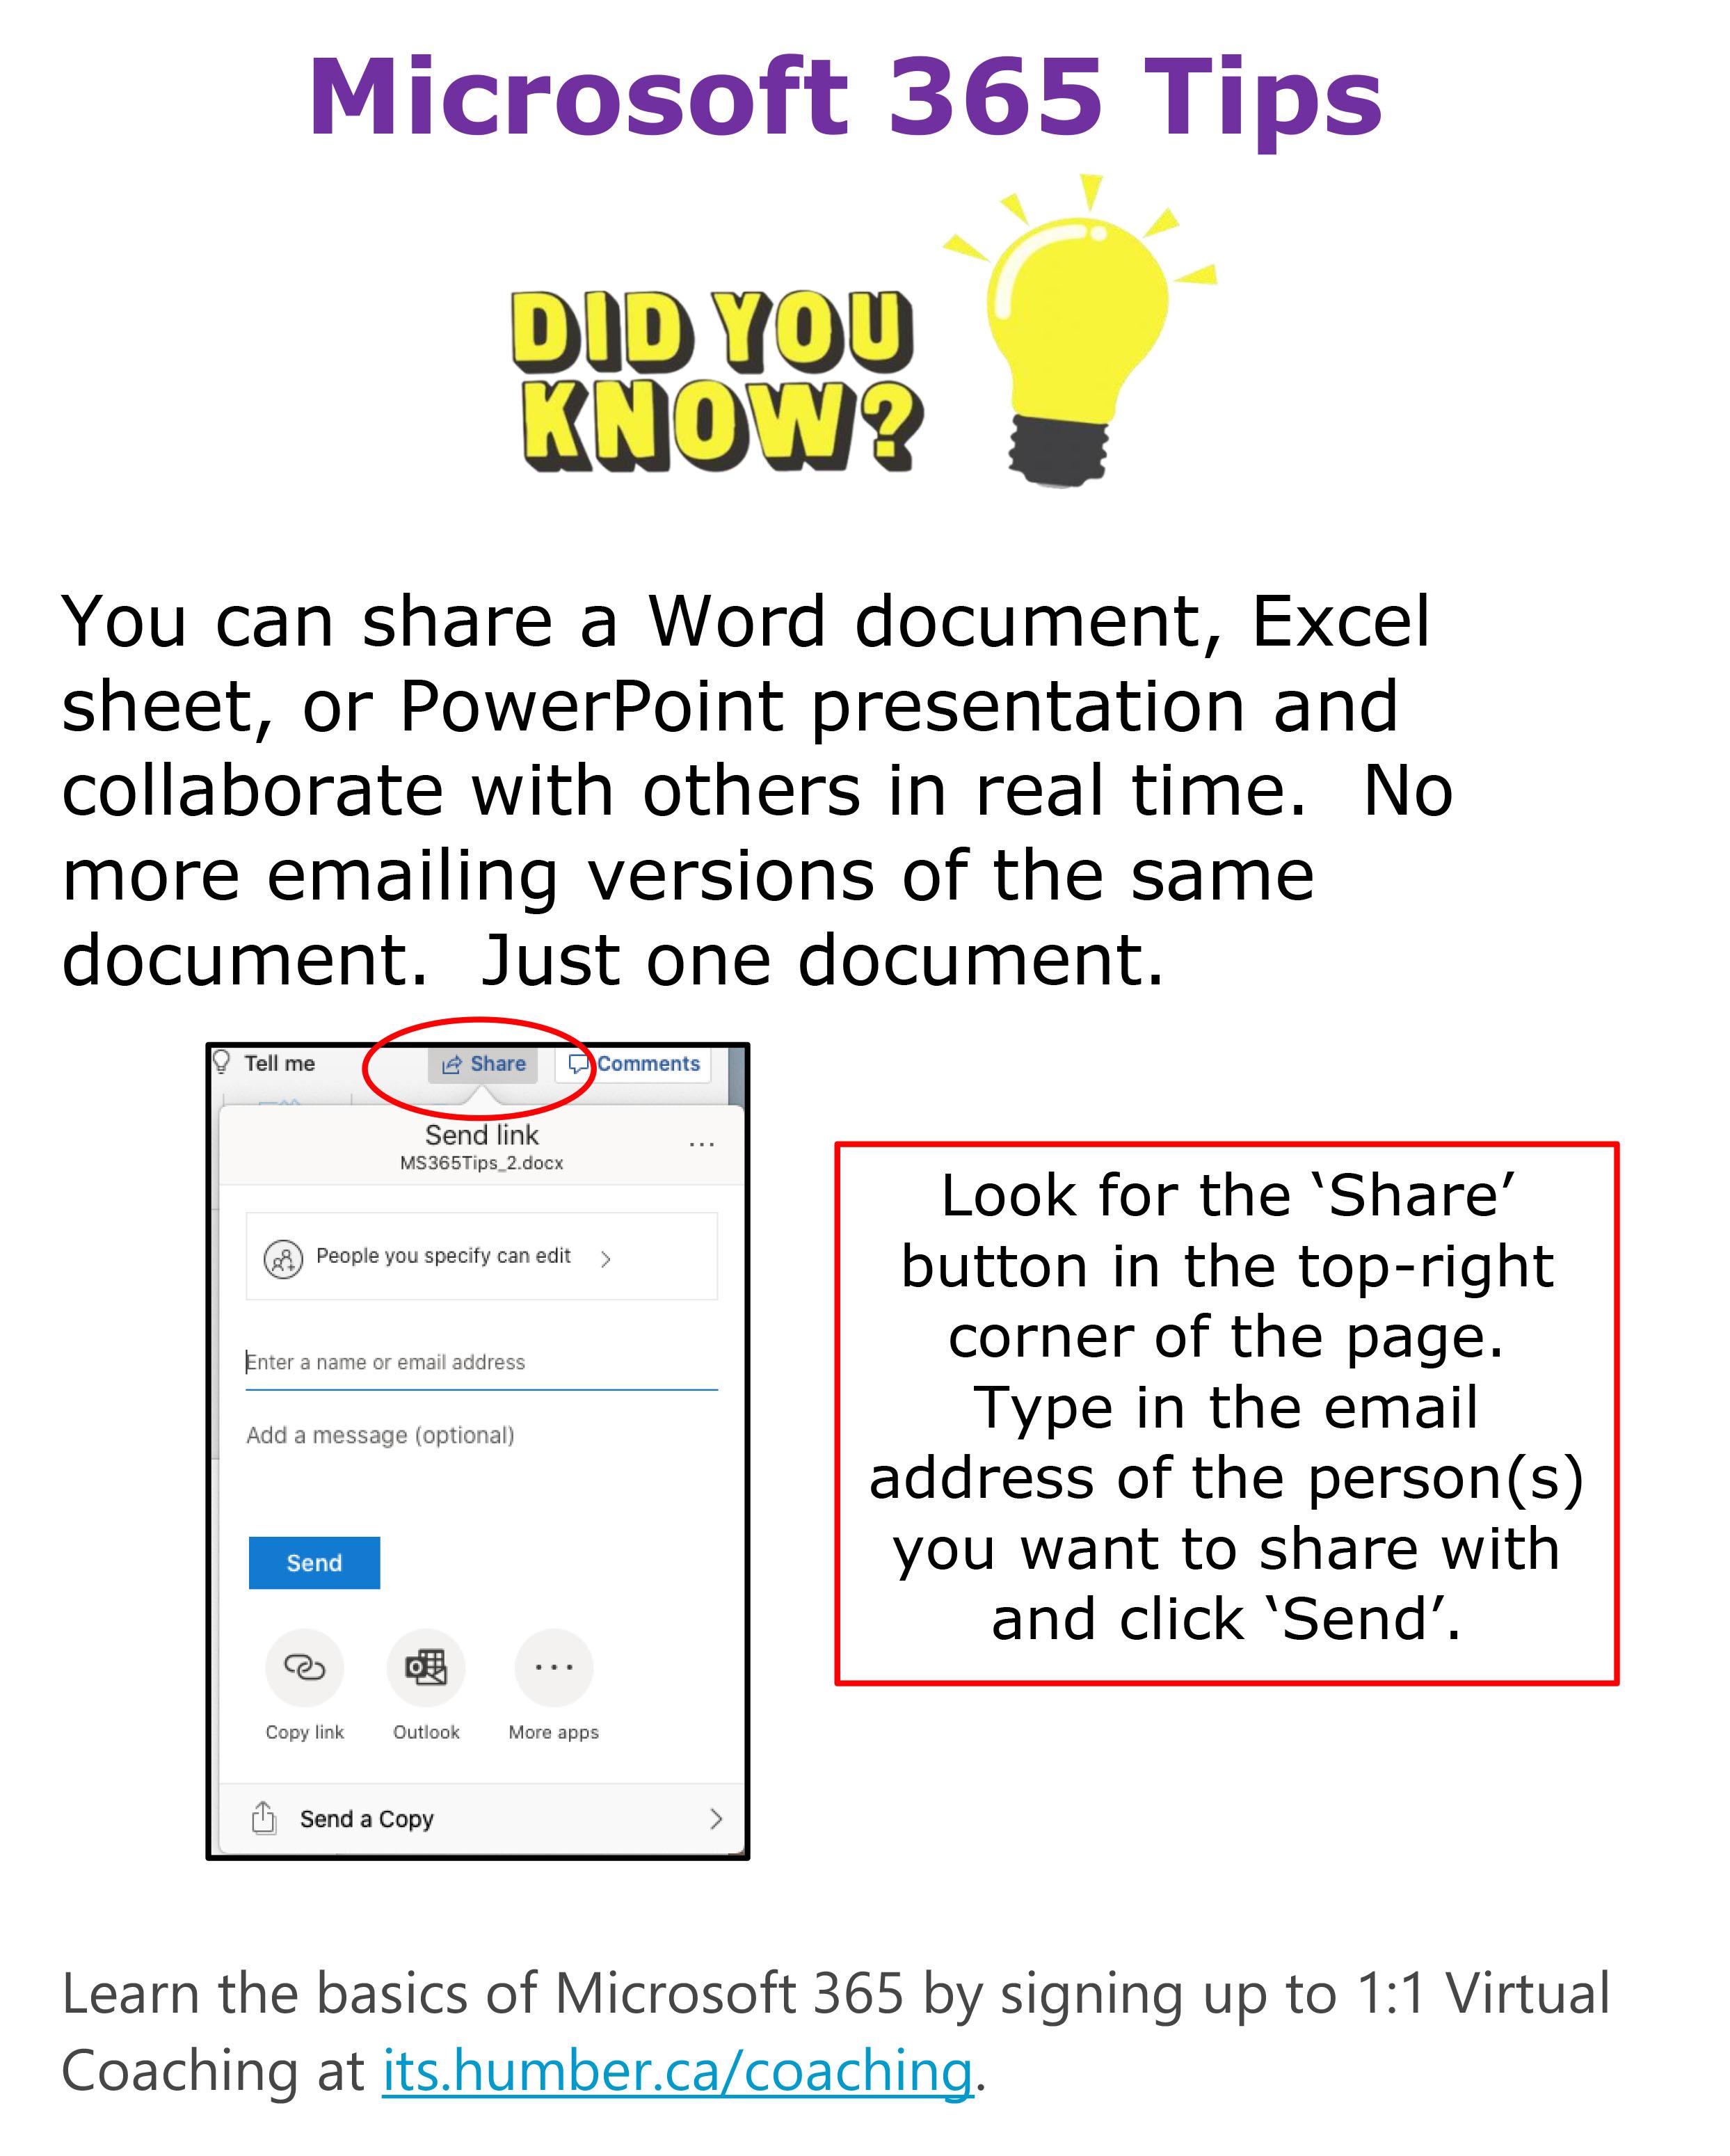 MS 365 Tip - Sharing